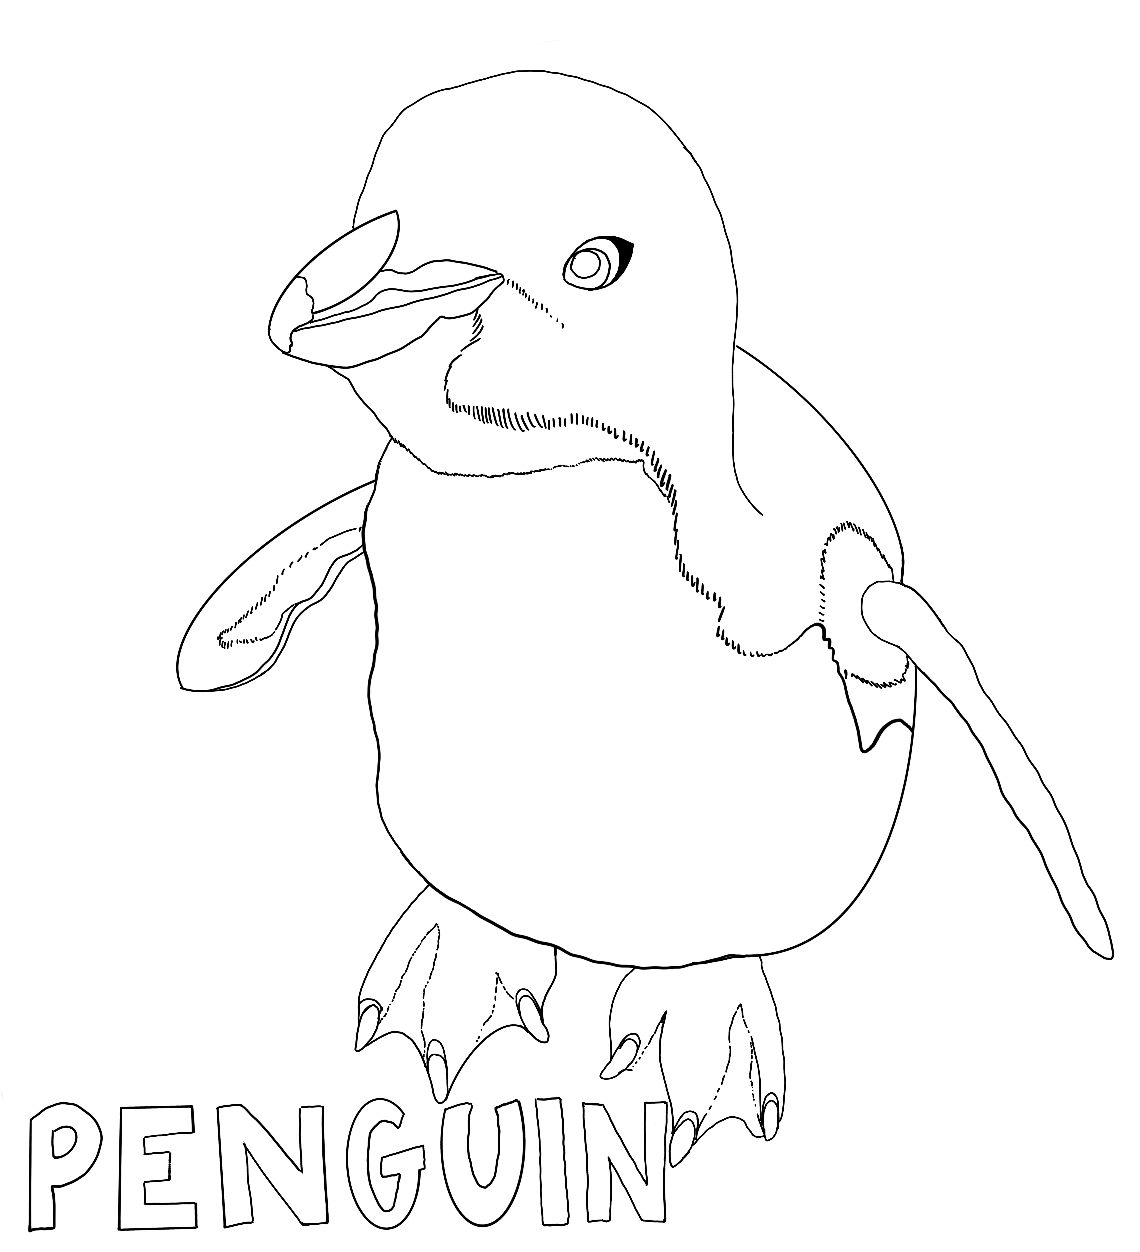 Penguin Coloring Page 7 Penguins International